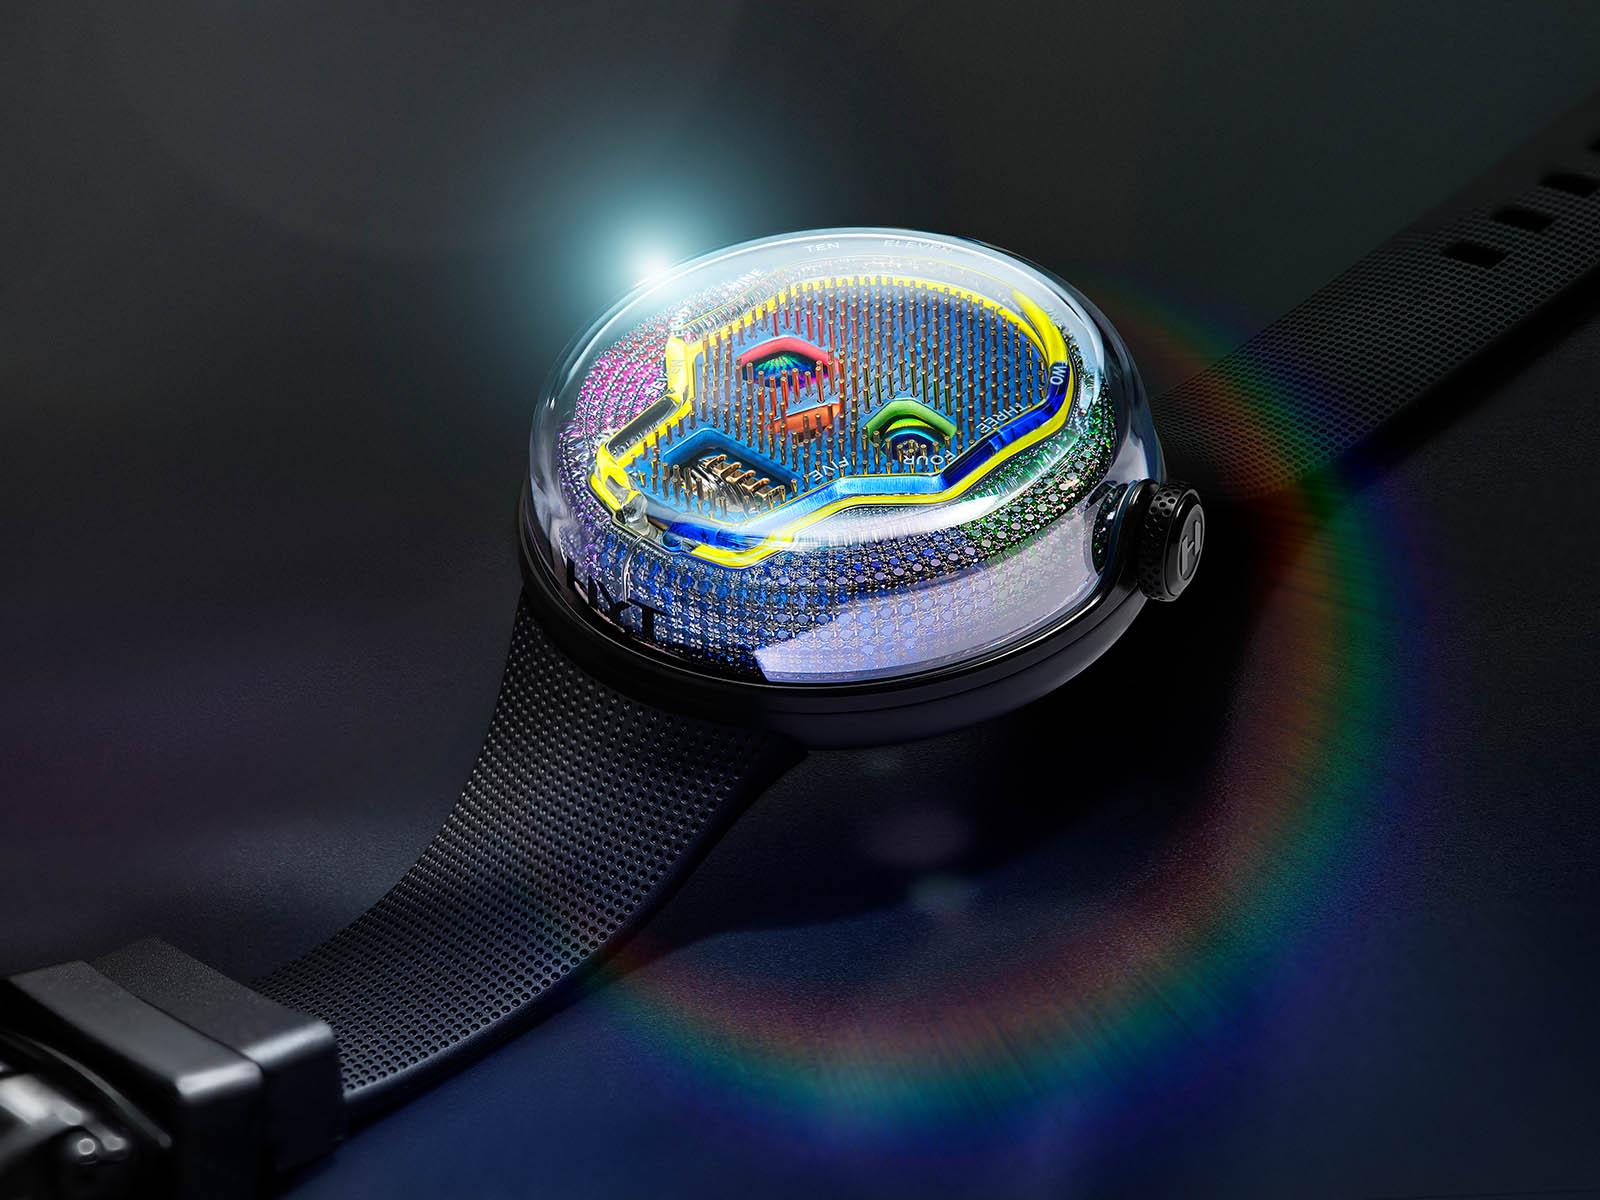 h02513-hyt-soonow-instant-rainbow-2.jpg